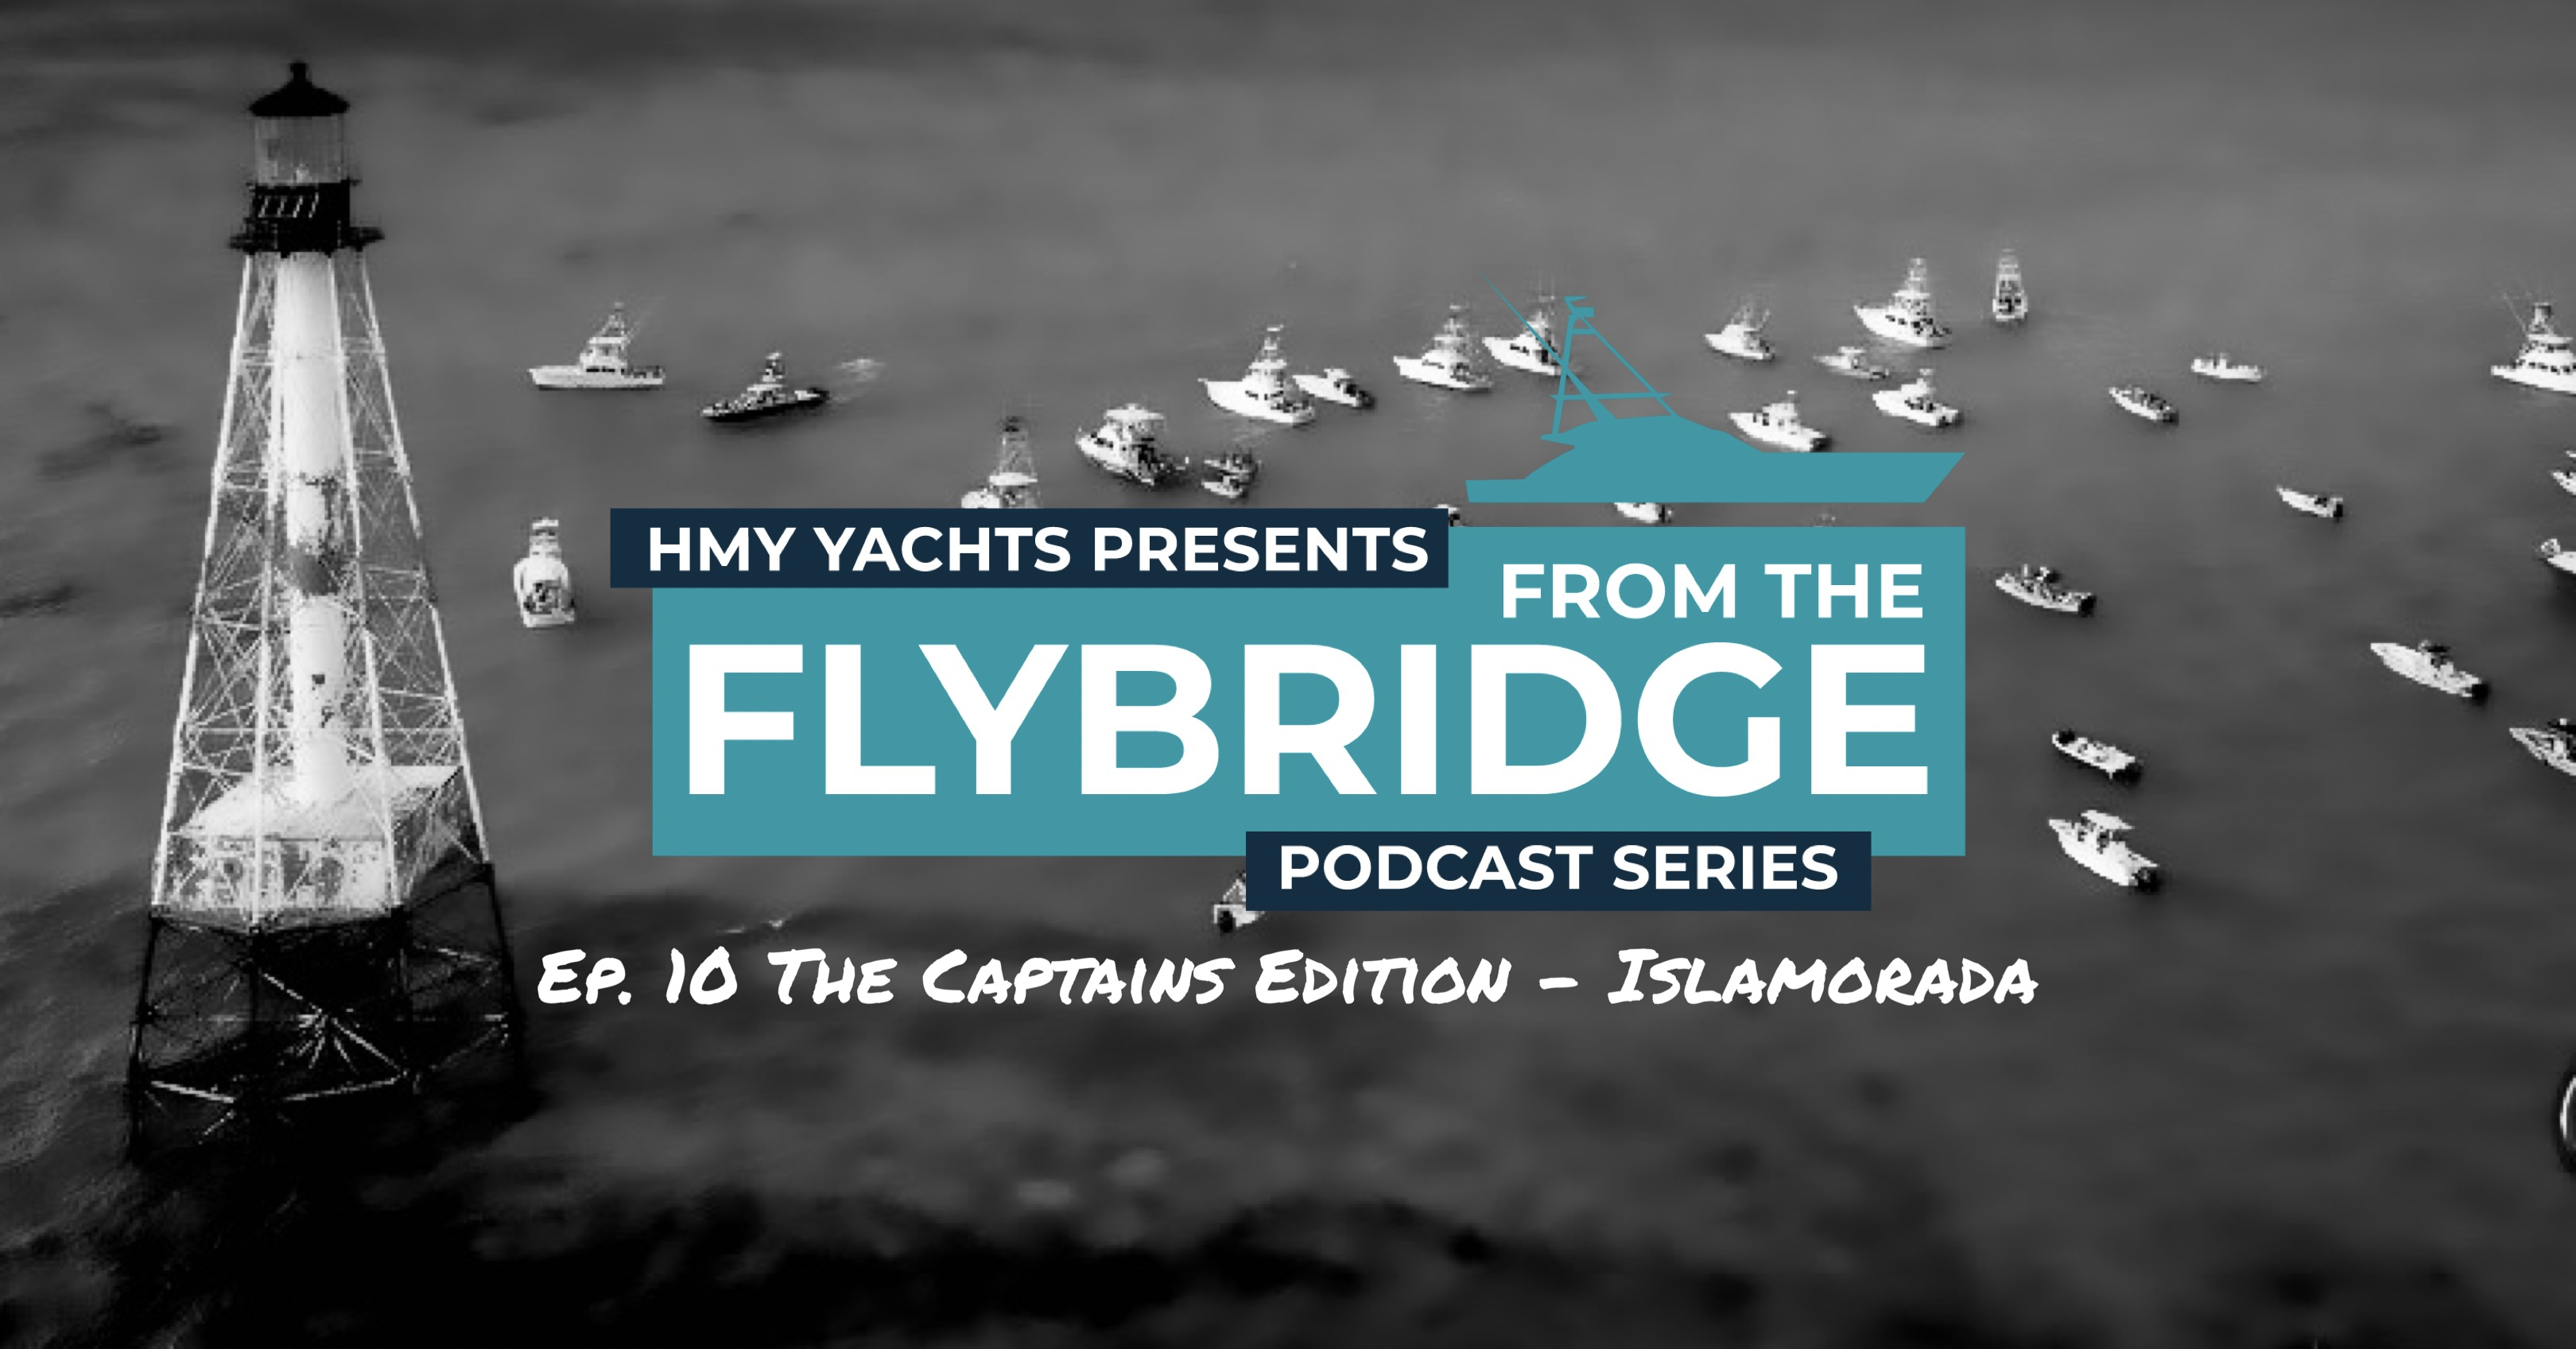 Podcast #10 – Fishing Guide to the Keys – Islamorada Captains Edition